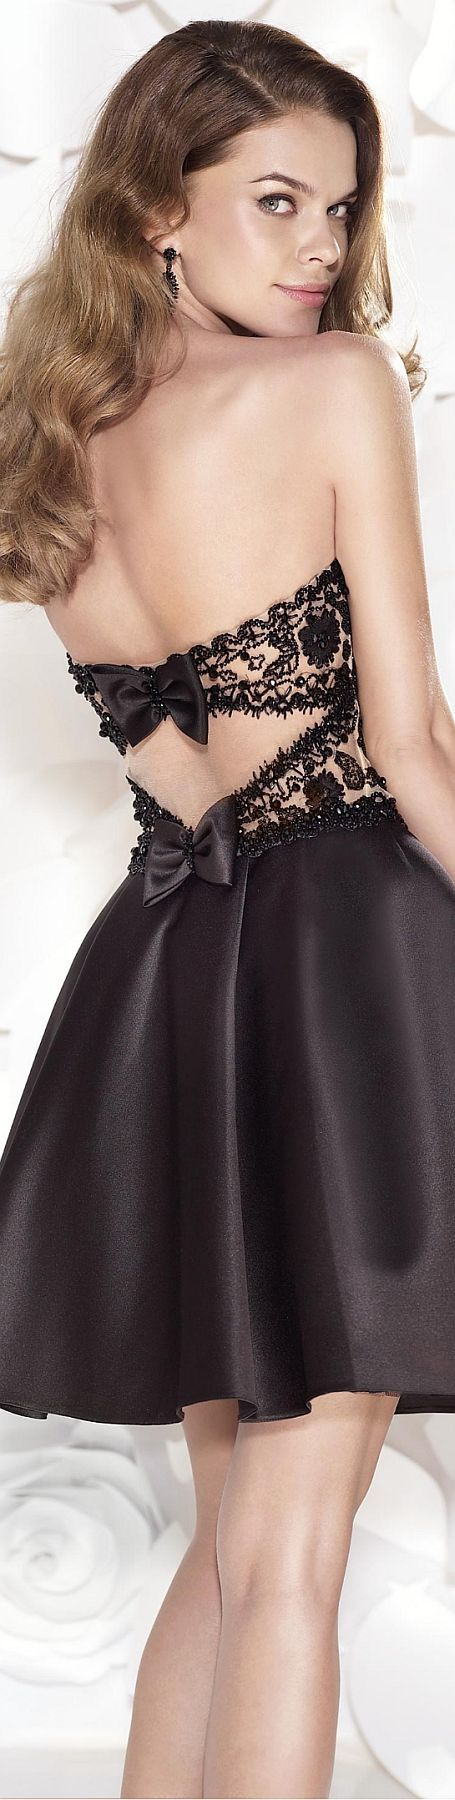 Lace prom dresses homecoming dress girl dresses b girls swag